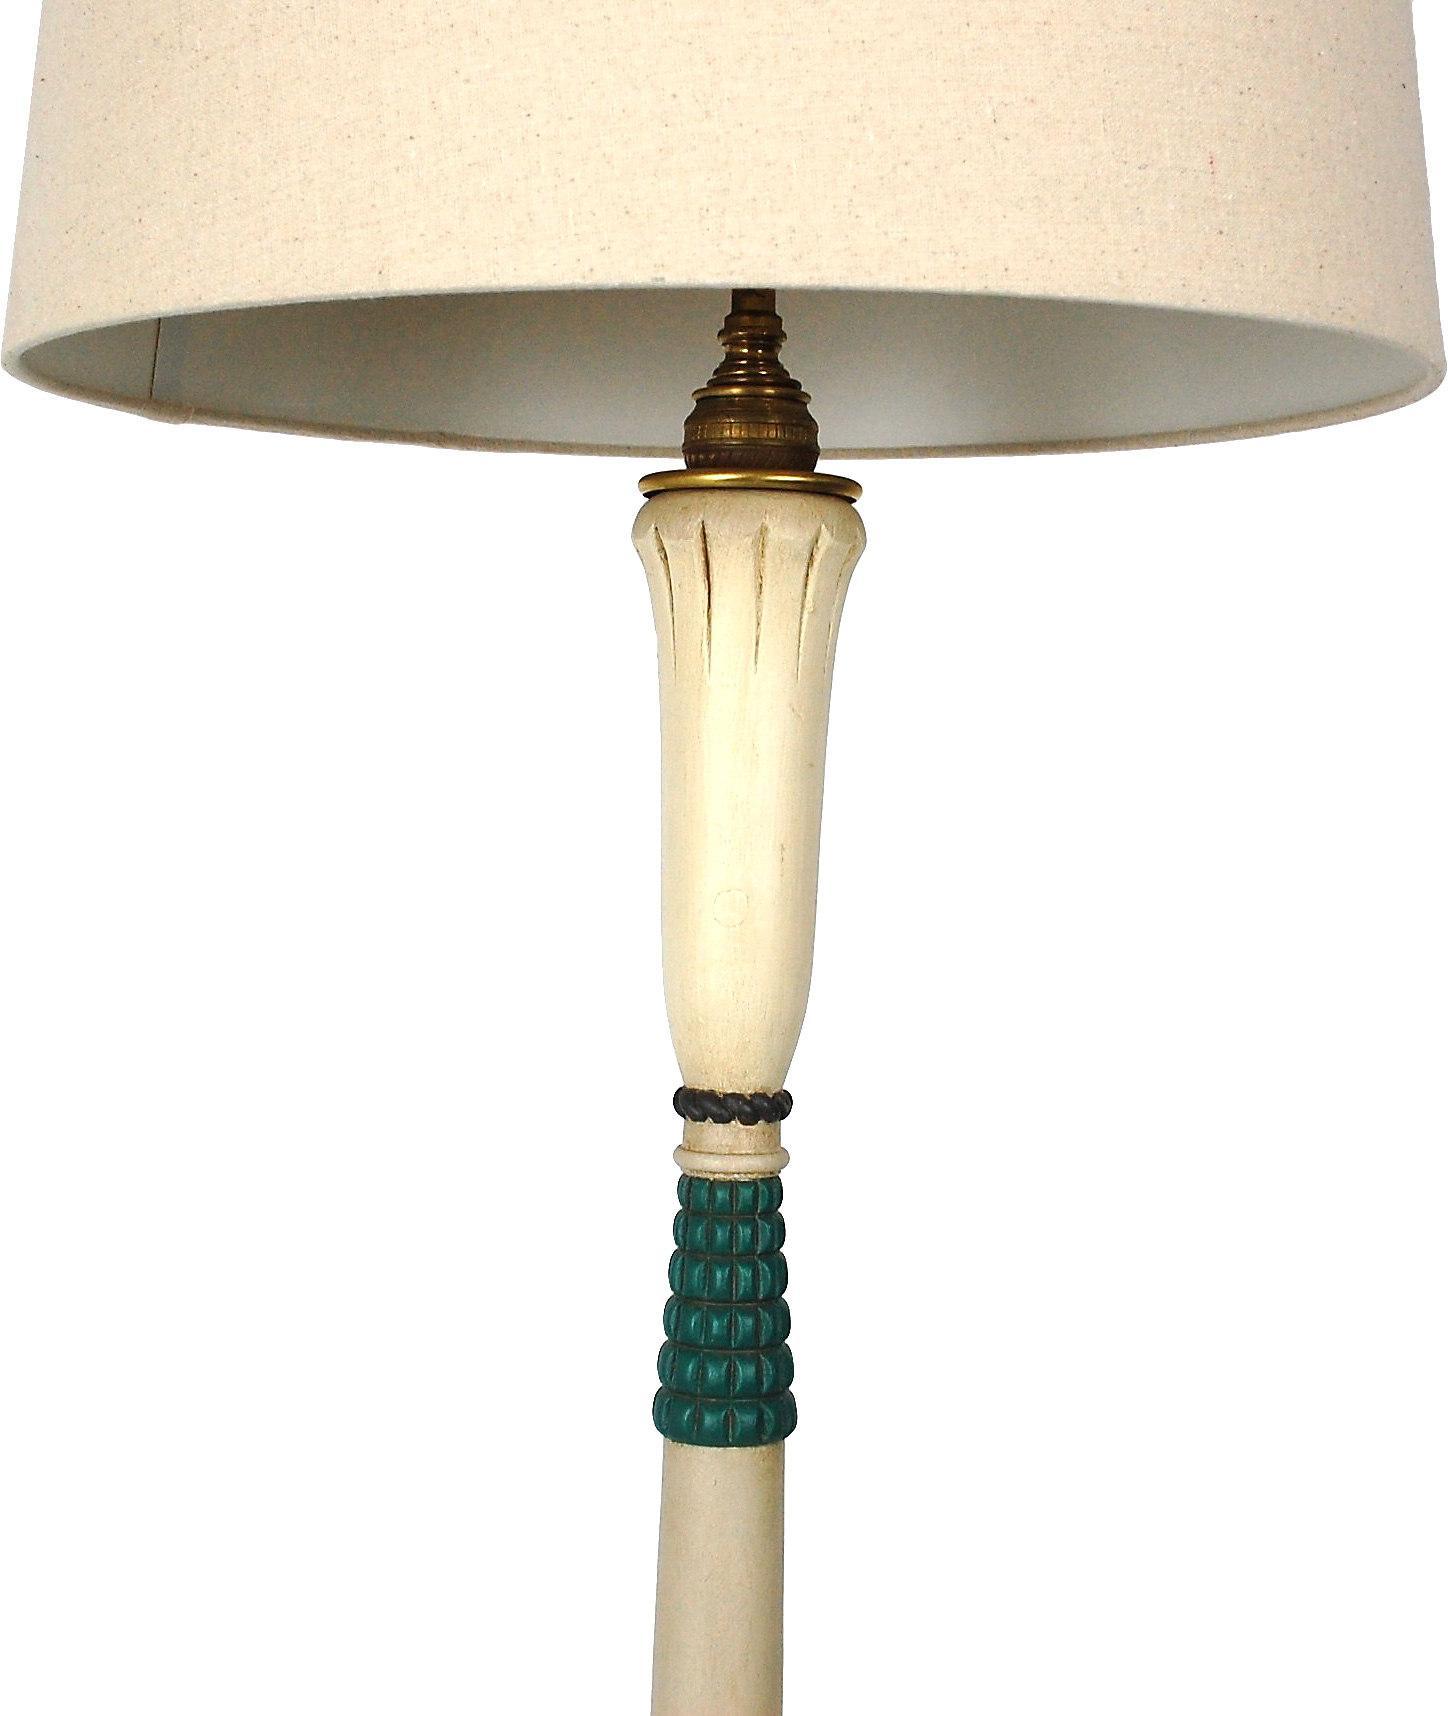 Art Deco Painted Wood Floor Lamp Chairish